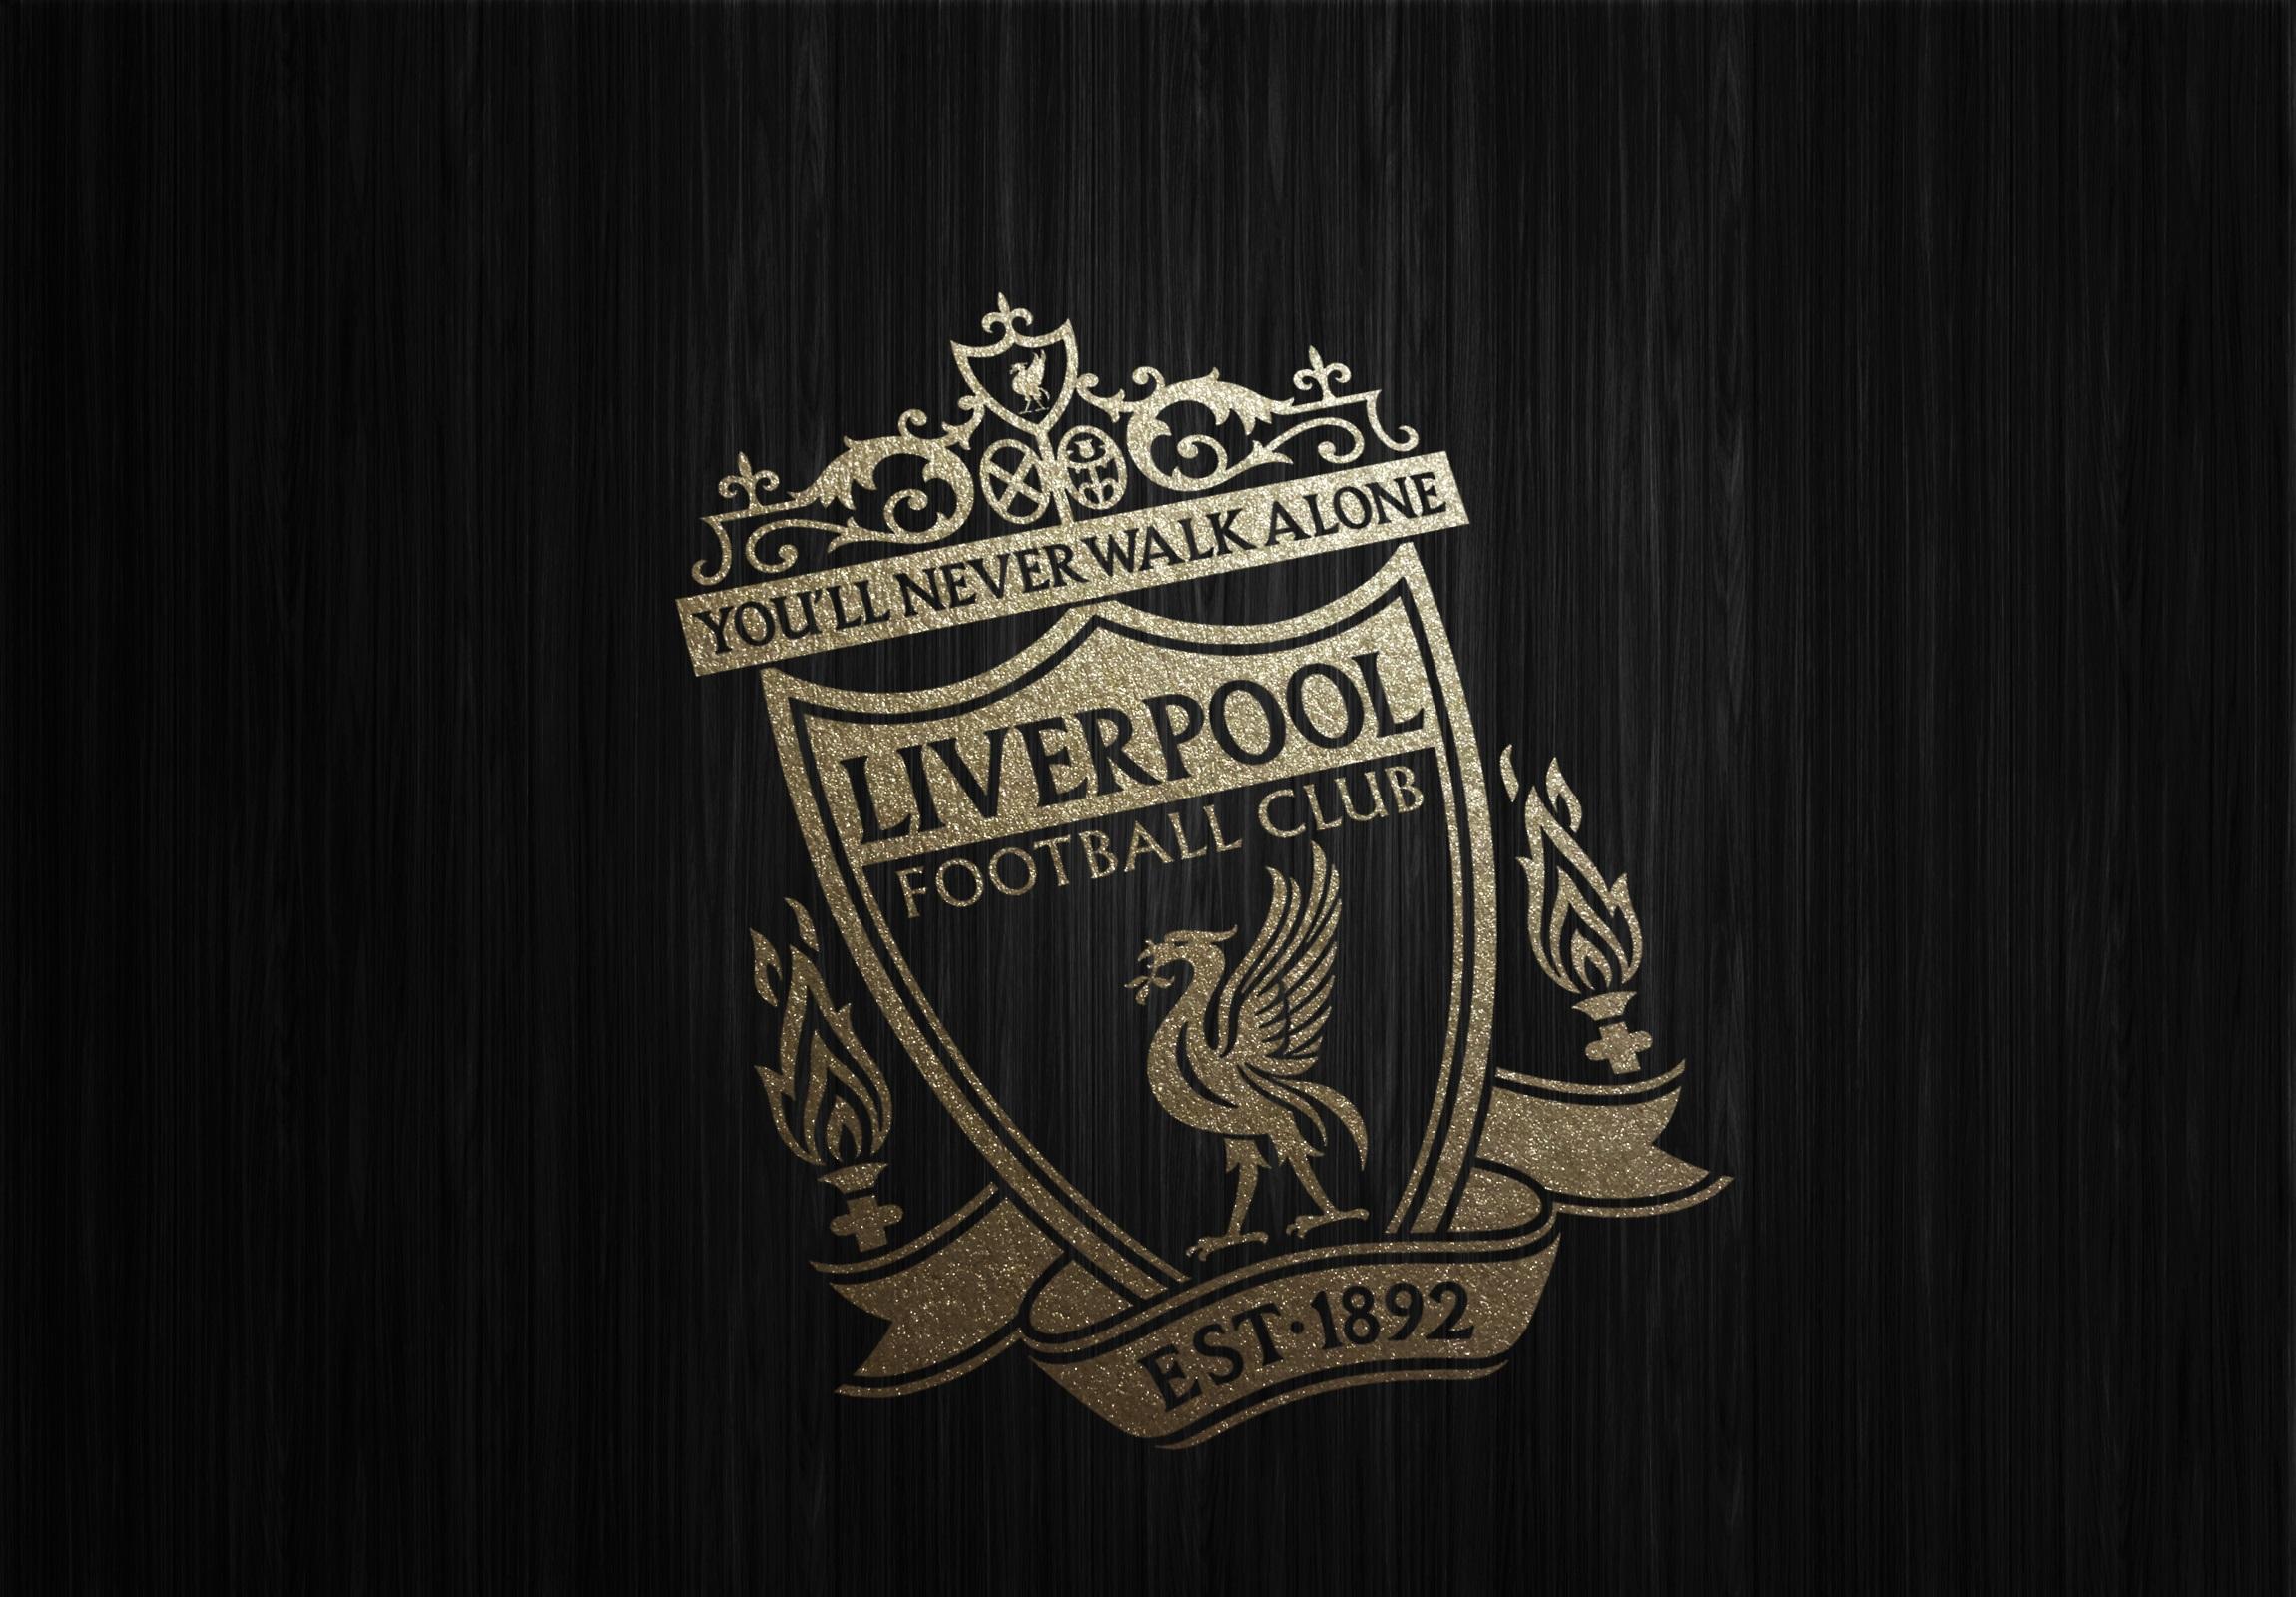 Chelsea Fc 3d Wallpapers Free Download Liverpool Backgrounds Pixelstalk Net